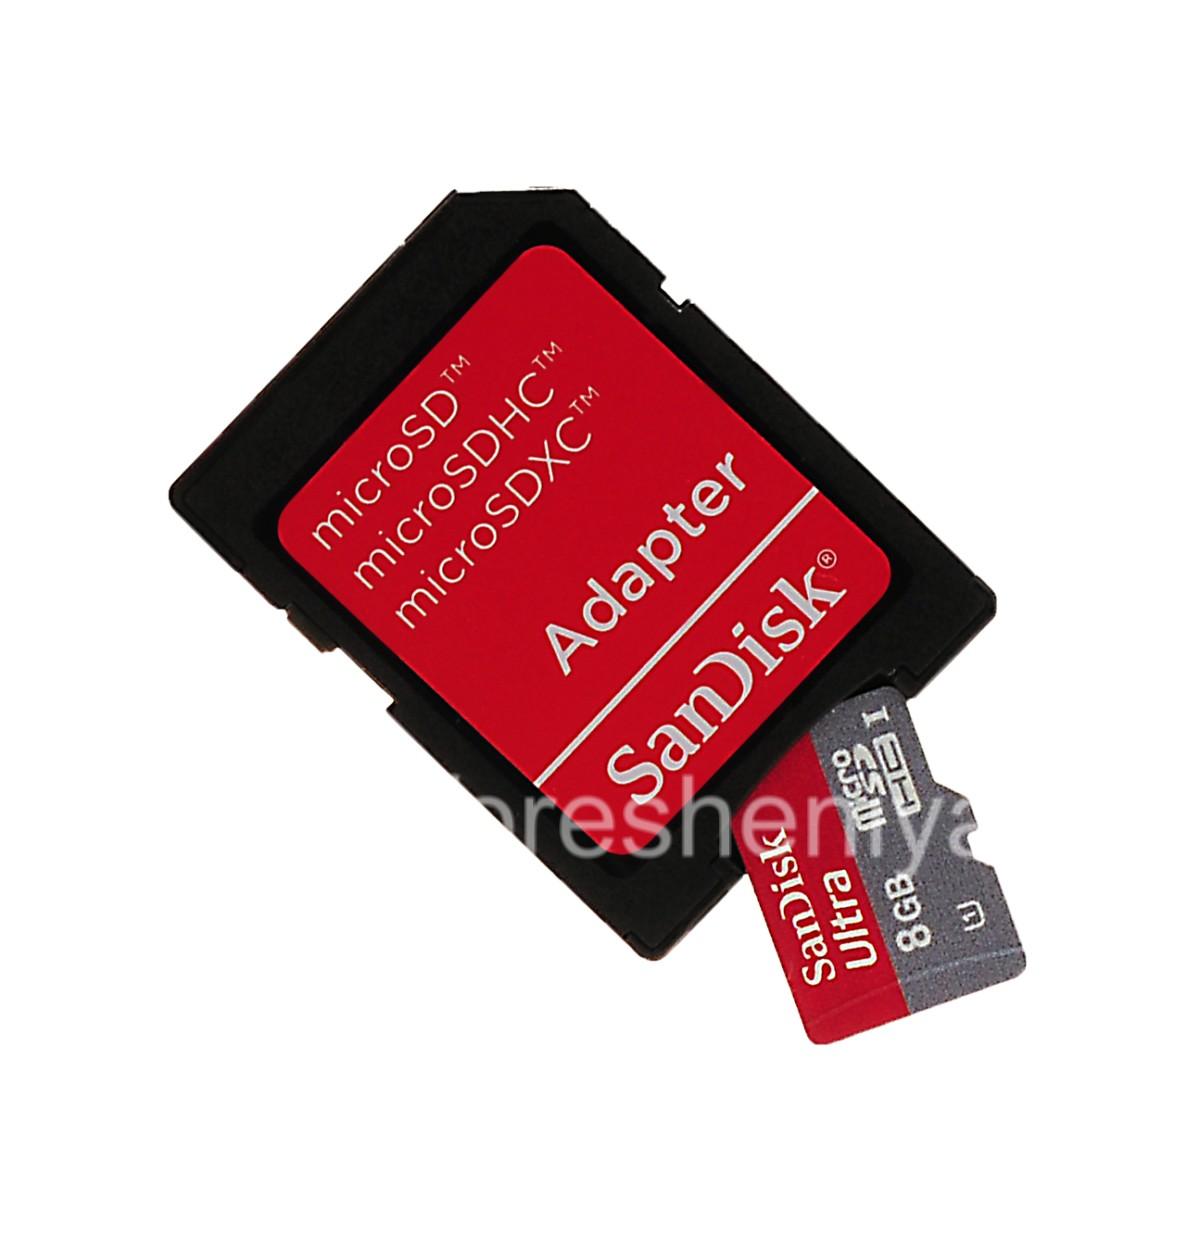 Branded memory card SanDisk Mobile Ultra MicroSD (microSDHC Class 10 UHS 1) 8GB for BlackBerry ...